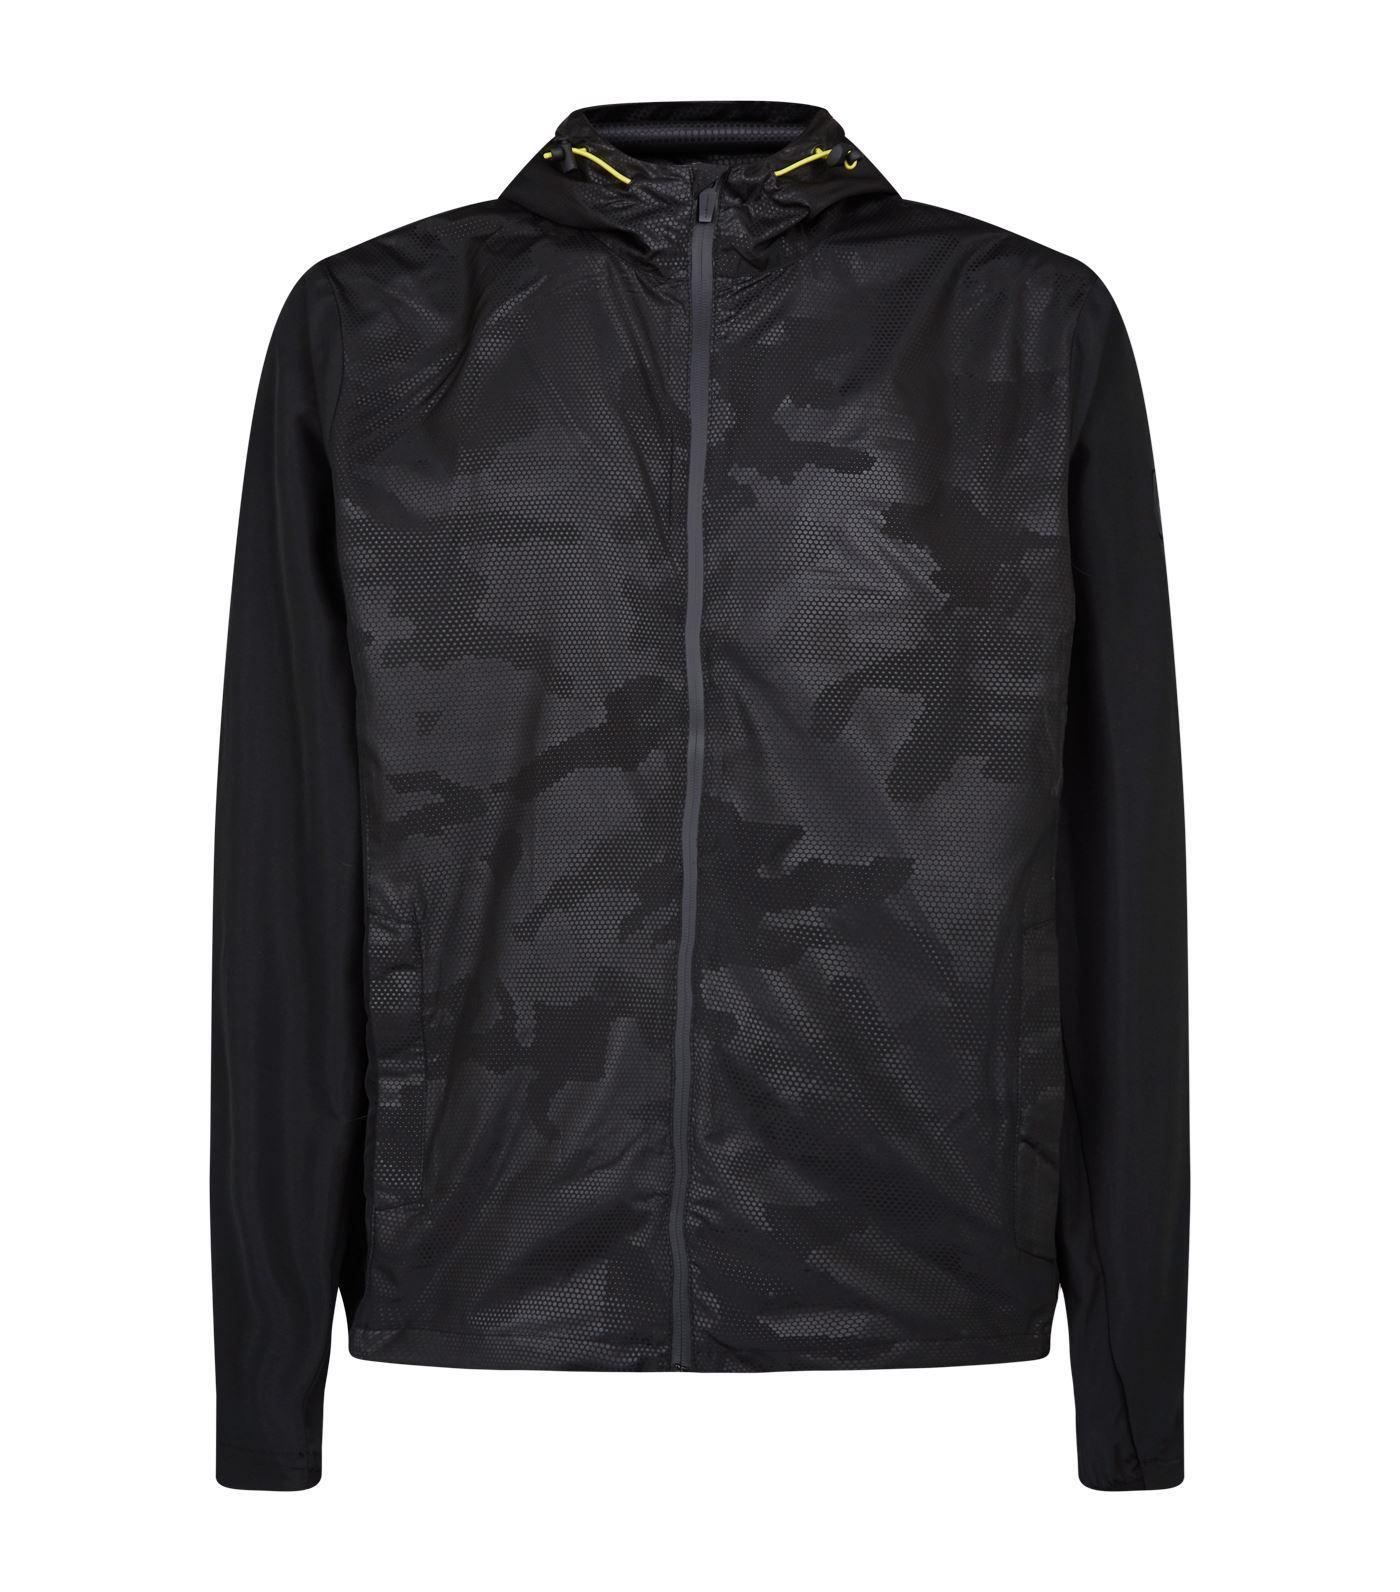 2522d40b89 Lyst - Hackett Aston Martin Zipped Jacket in Black for Men